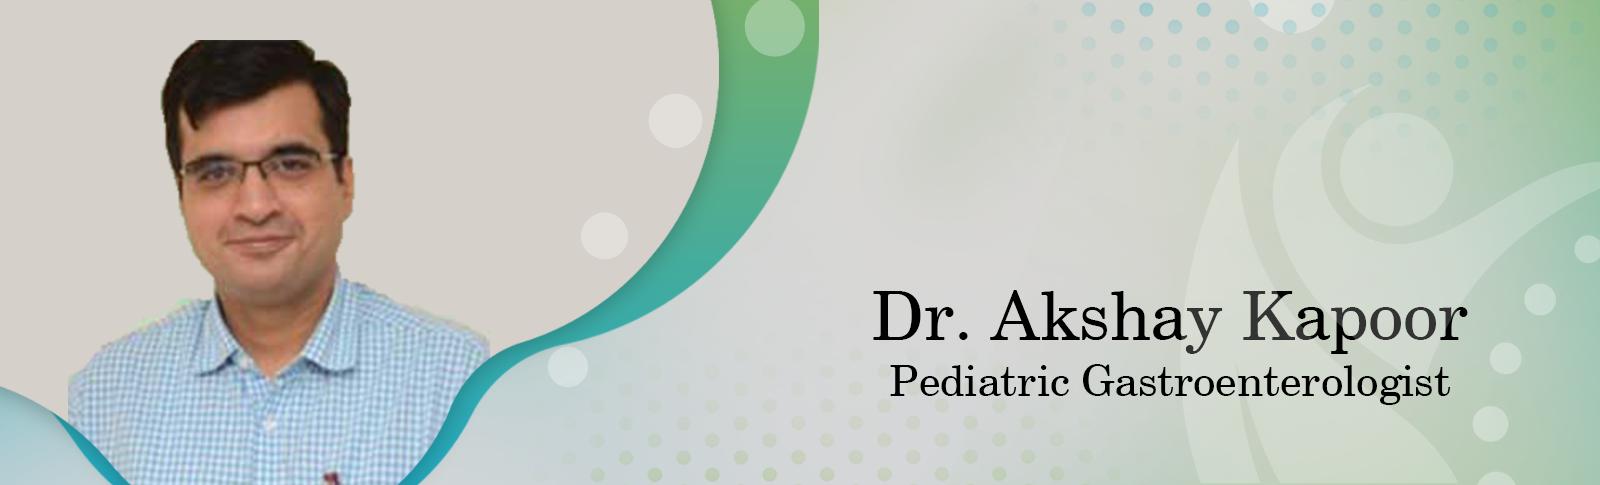 Dr. Akshay Kapoor